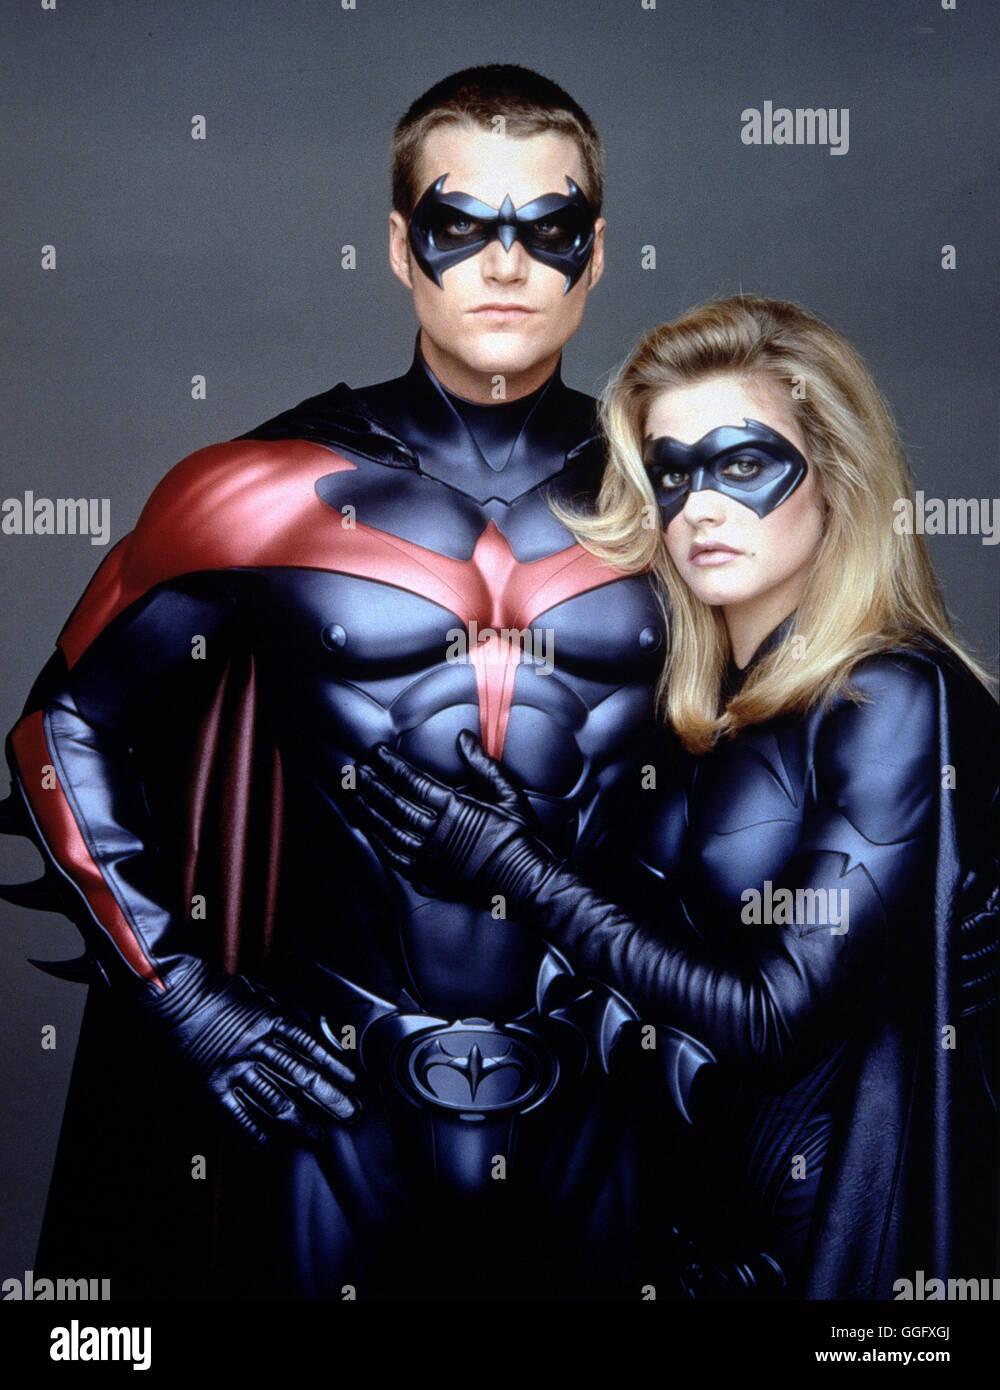 Batman et robin batman robin usa 1997 joel schumacher chris o 39 donnell robin alicia - Image de batman et robin ...